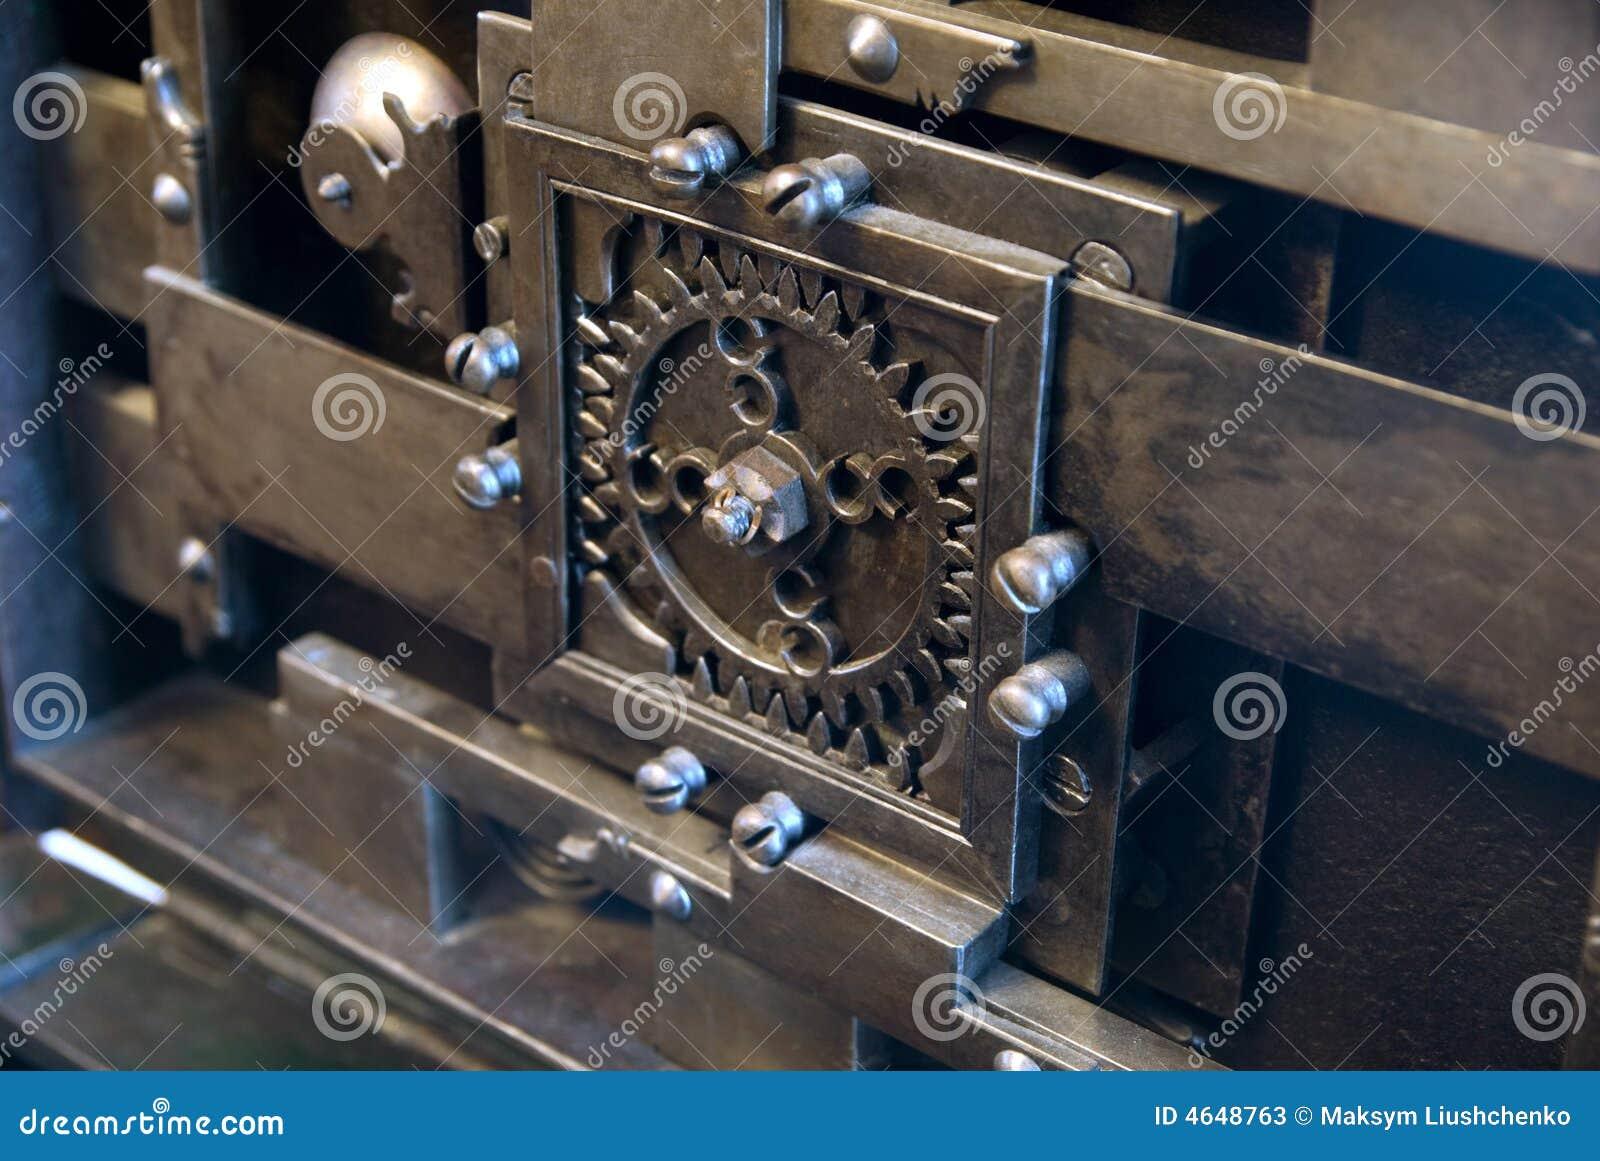 Mecanismo velho